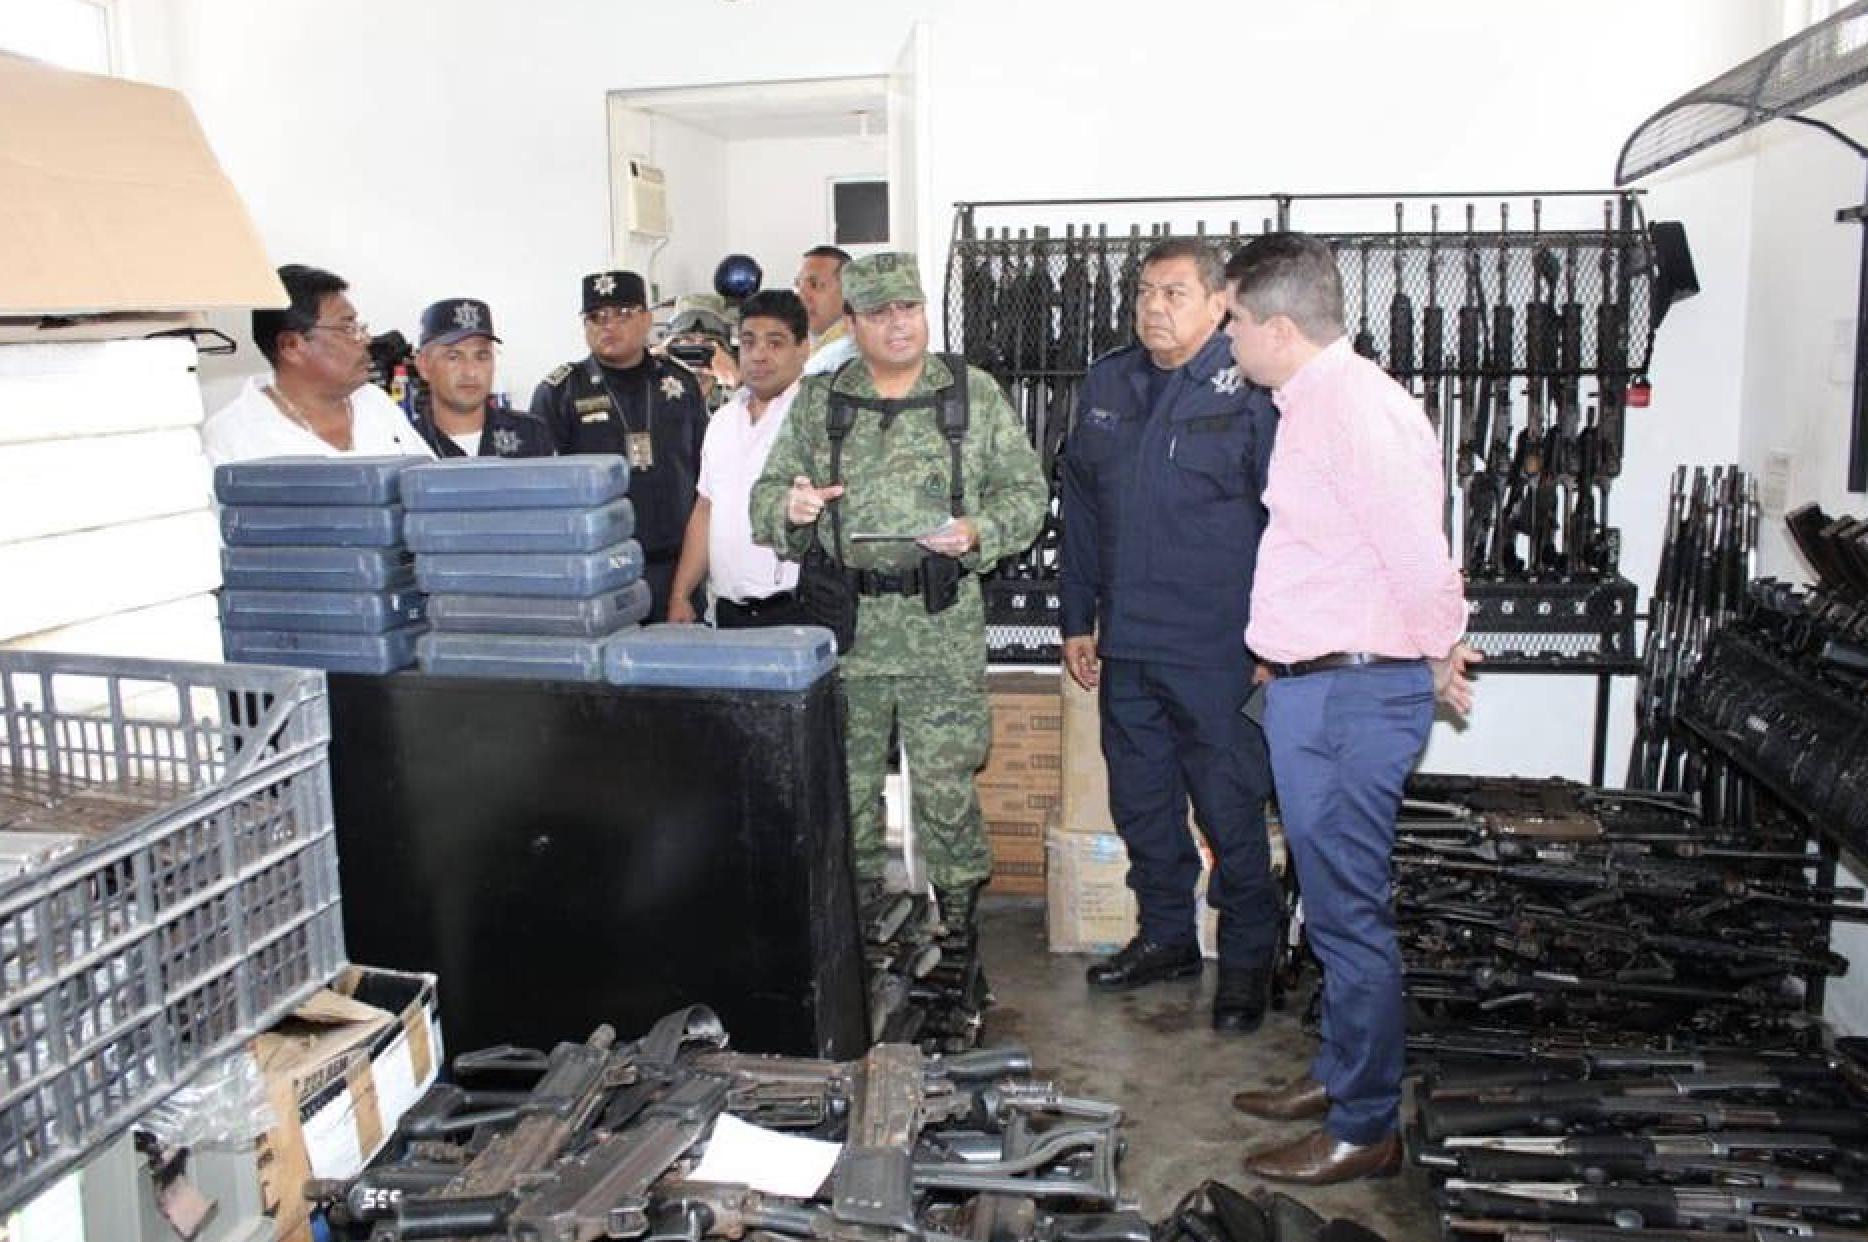 Ejército pide a alcalde de Acapulco explicar 342 armas faltantes